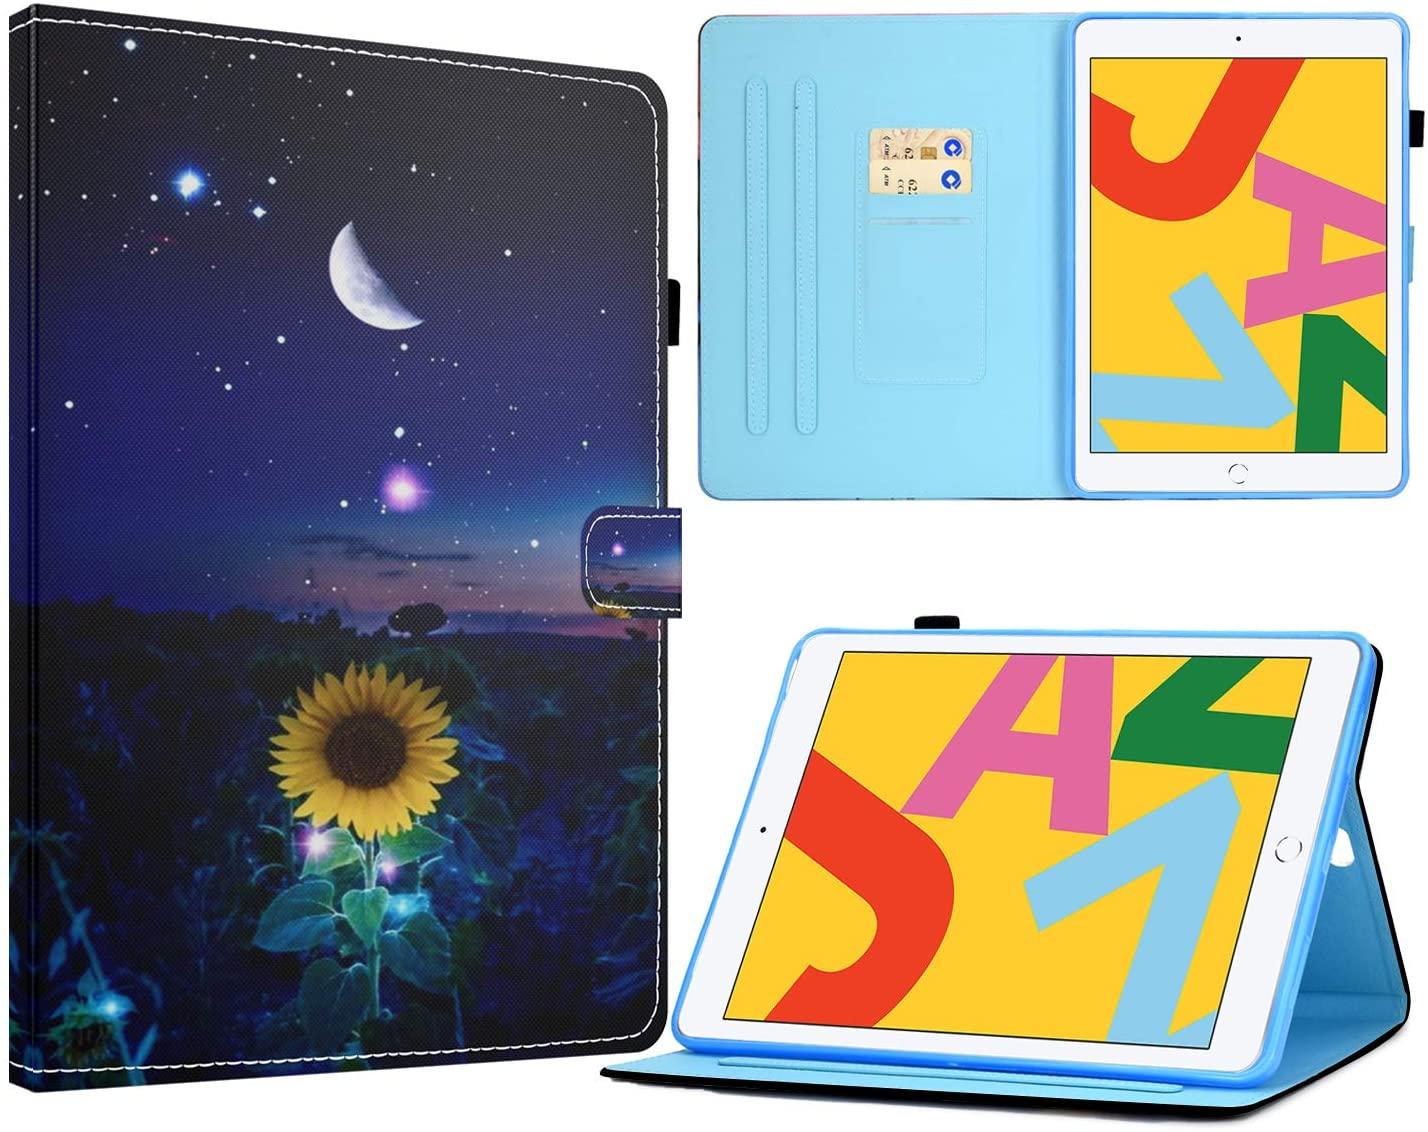 iPad Mini 5 Case,iPad mini4/3/2/1 Case,Vobber Lightweight Folio Stand Wallet Smart PU Leather Cover with Auto Sleep/Wake for Apple iPad Mini 5/4/3/2/1 7.9